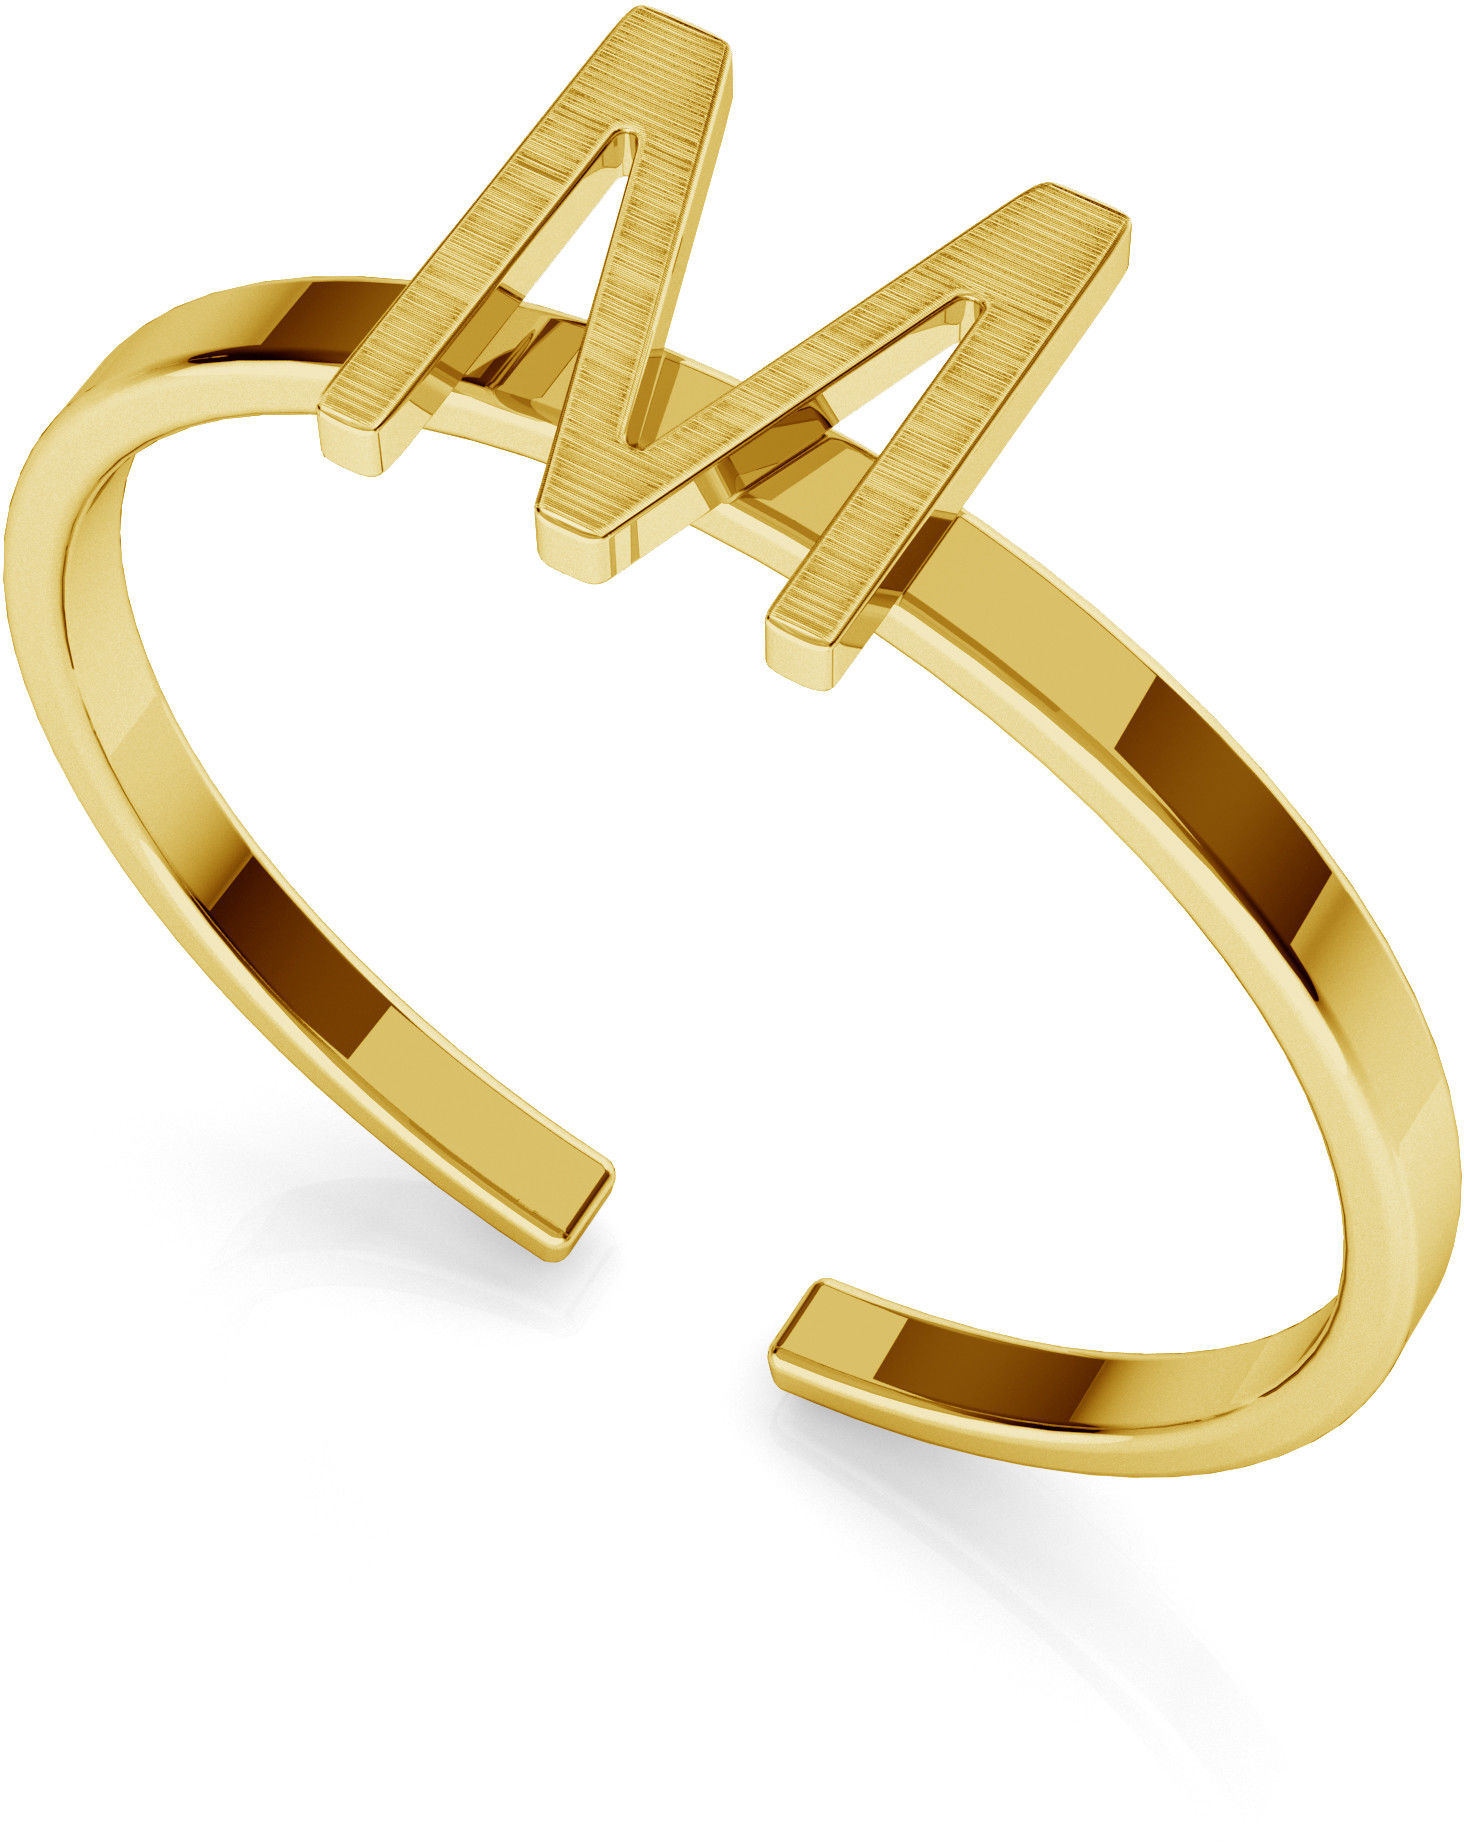 Srebrny pierścionek z literką My RING, srebro 925 : Litera - H, Srebro - kolor pokrycia - Pokrycie żółtym 18K złotem